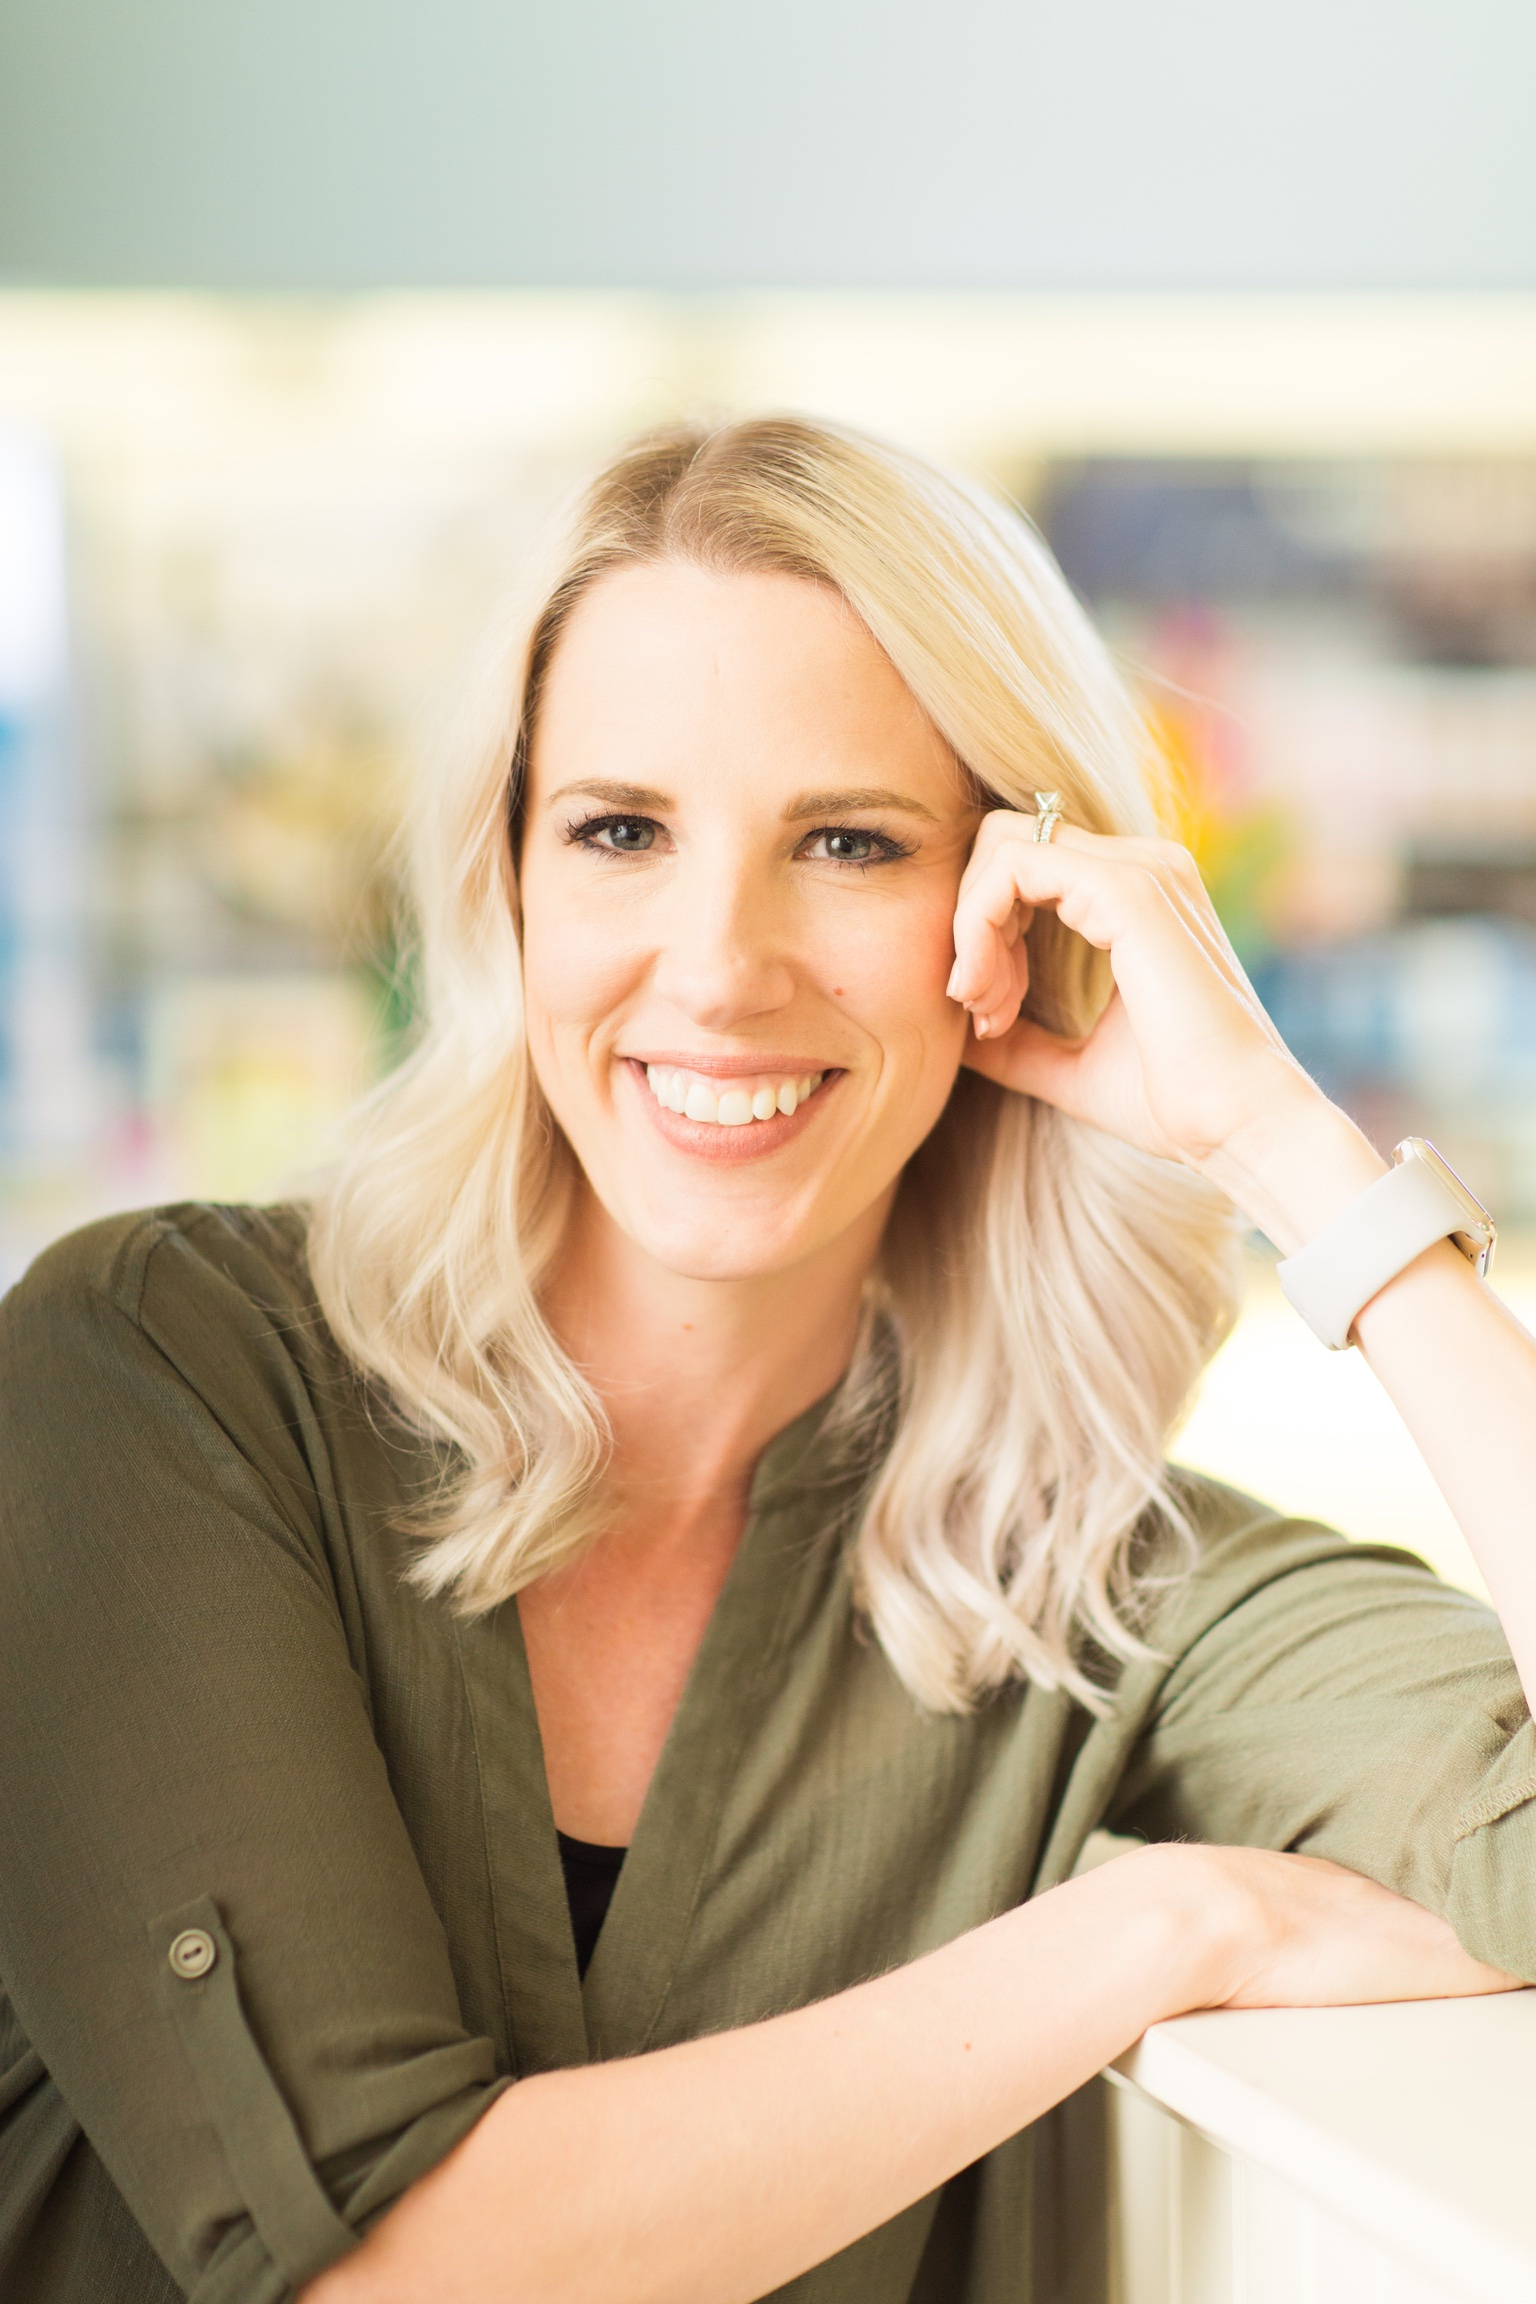 Woman Owned Business Urban Betty Hair Salon Announces